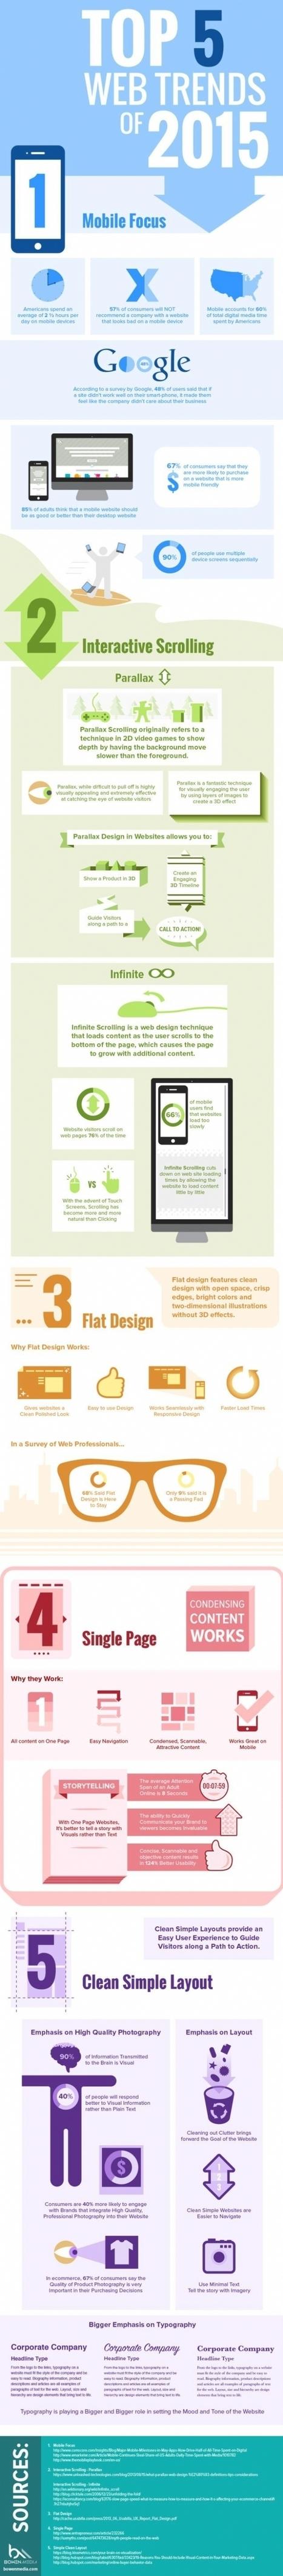 Web design : les cinq tendances marquantes de 2015 | Laurent Dufaud | Scoop.it